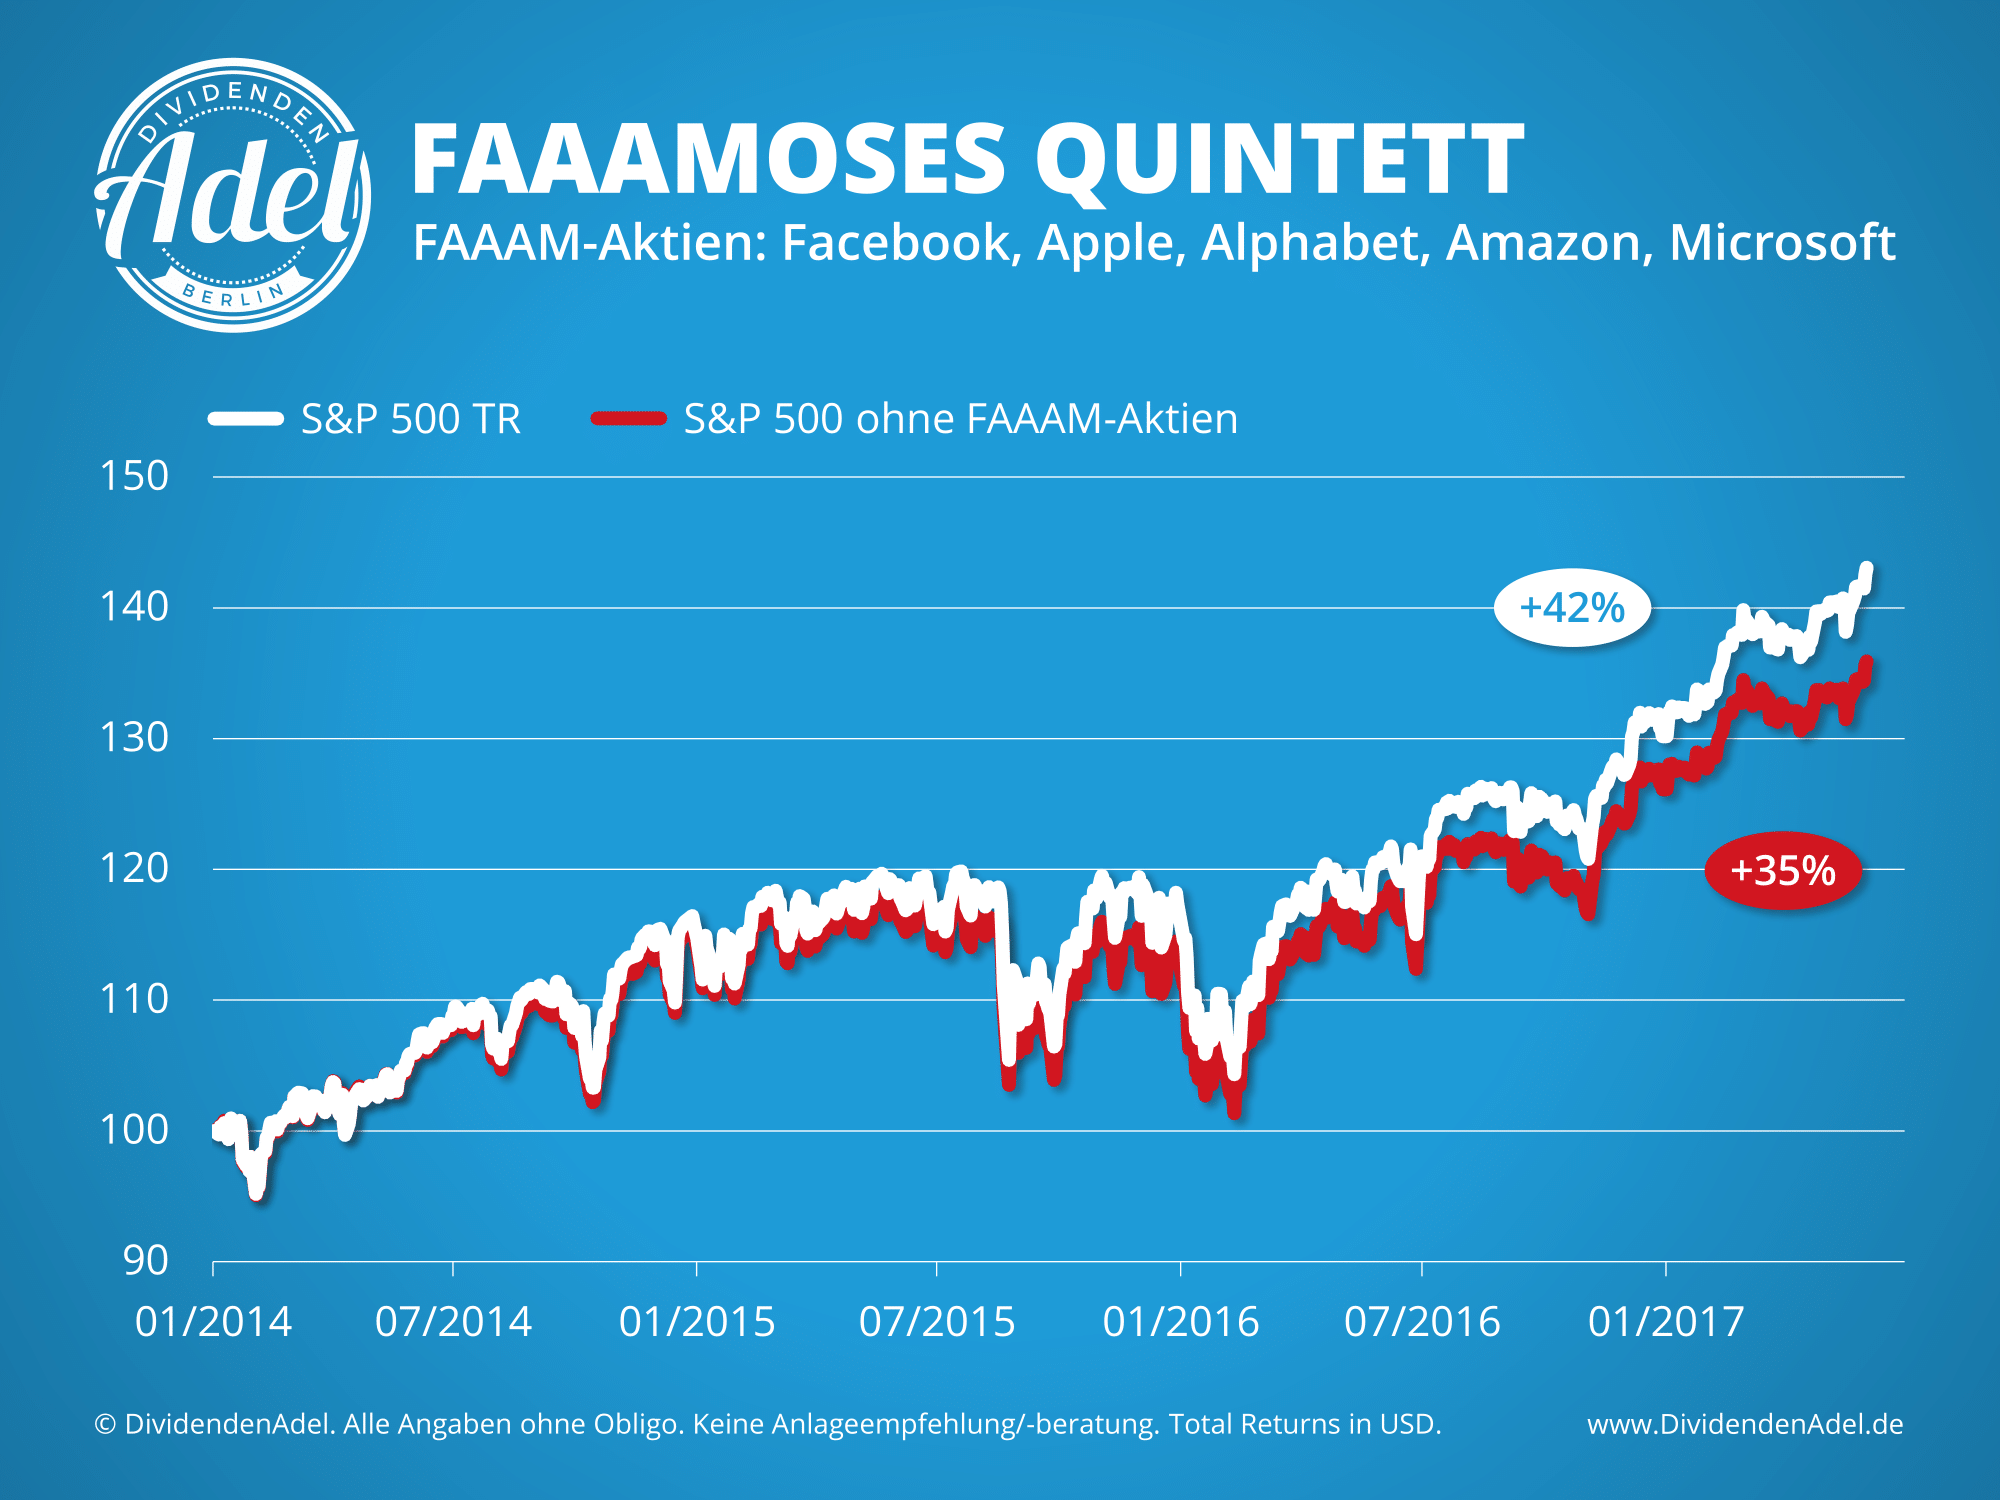 S&P 500 ex FAAAM seit 2014